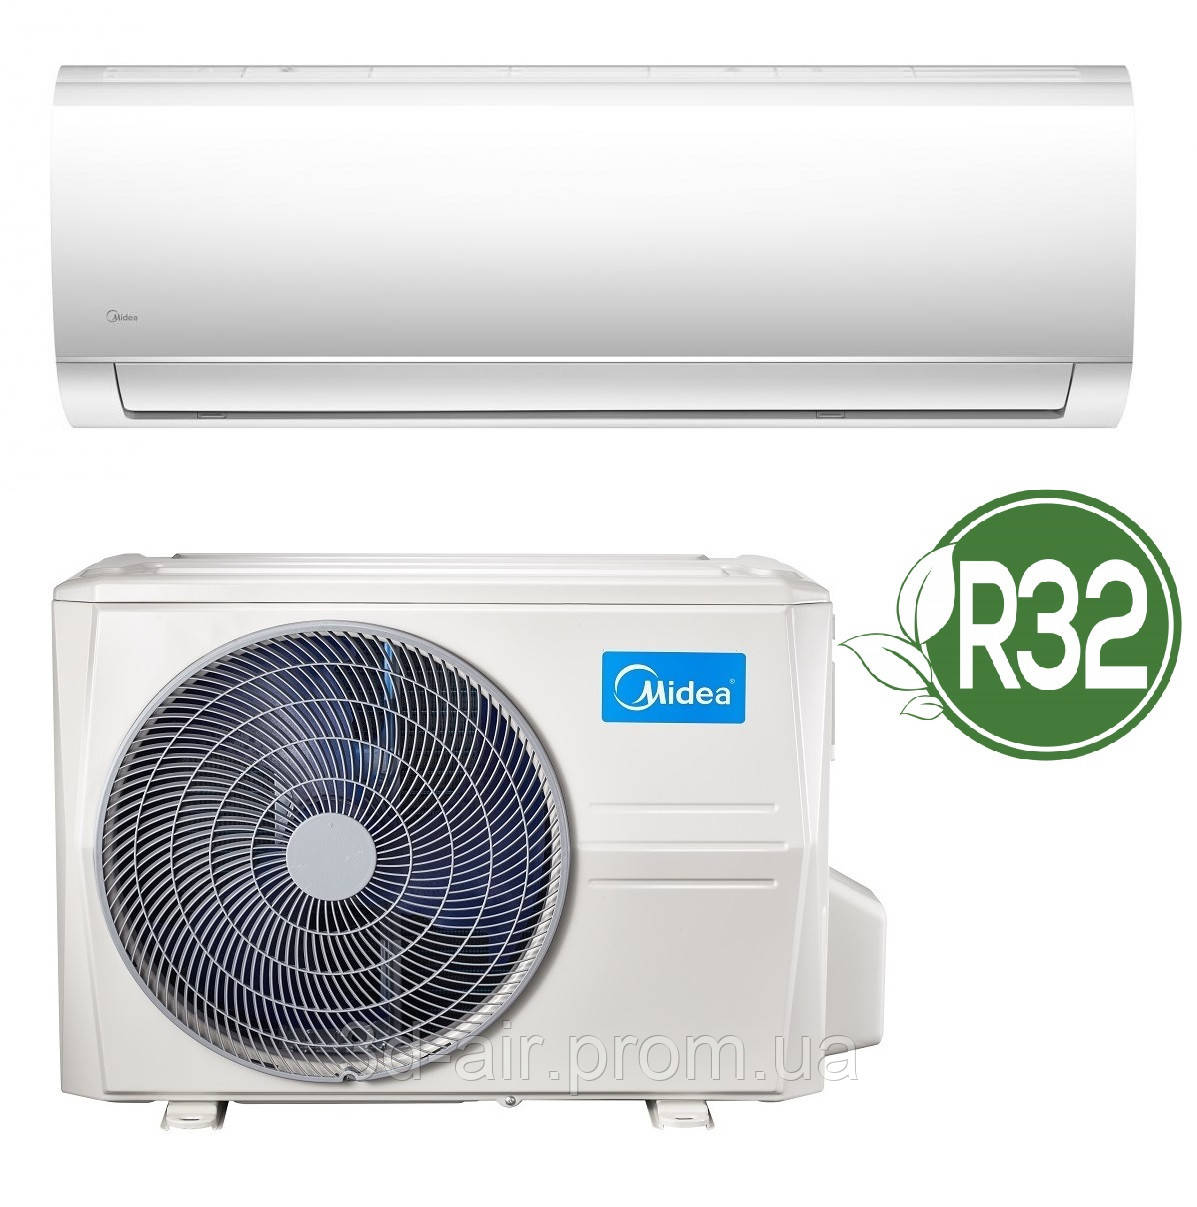 Кондиционер Midea Blanc DС Inverter R32 MA-24N8DOHI-I/MA-24N8DOH-O